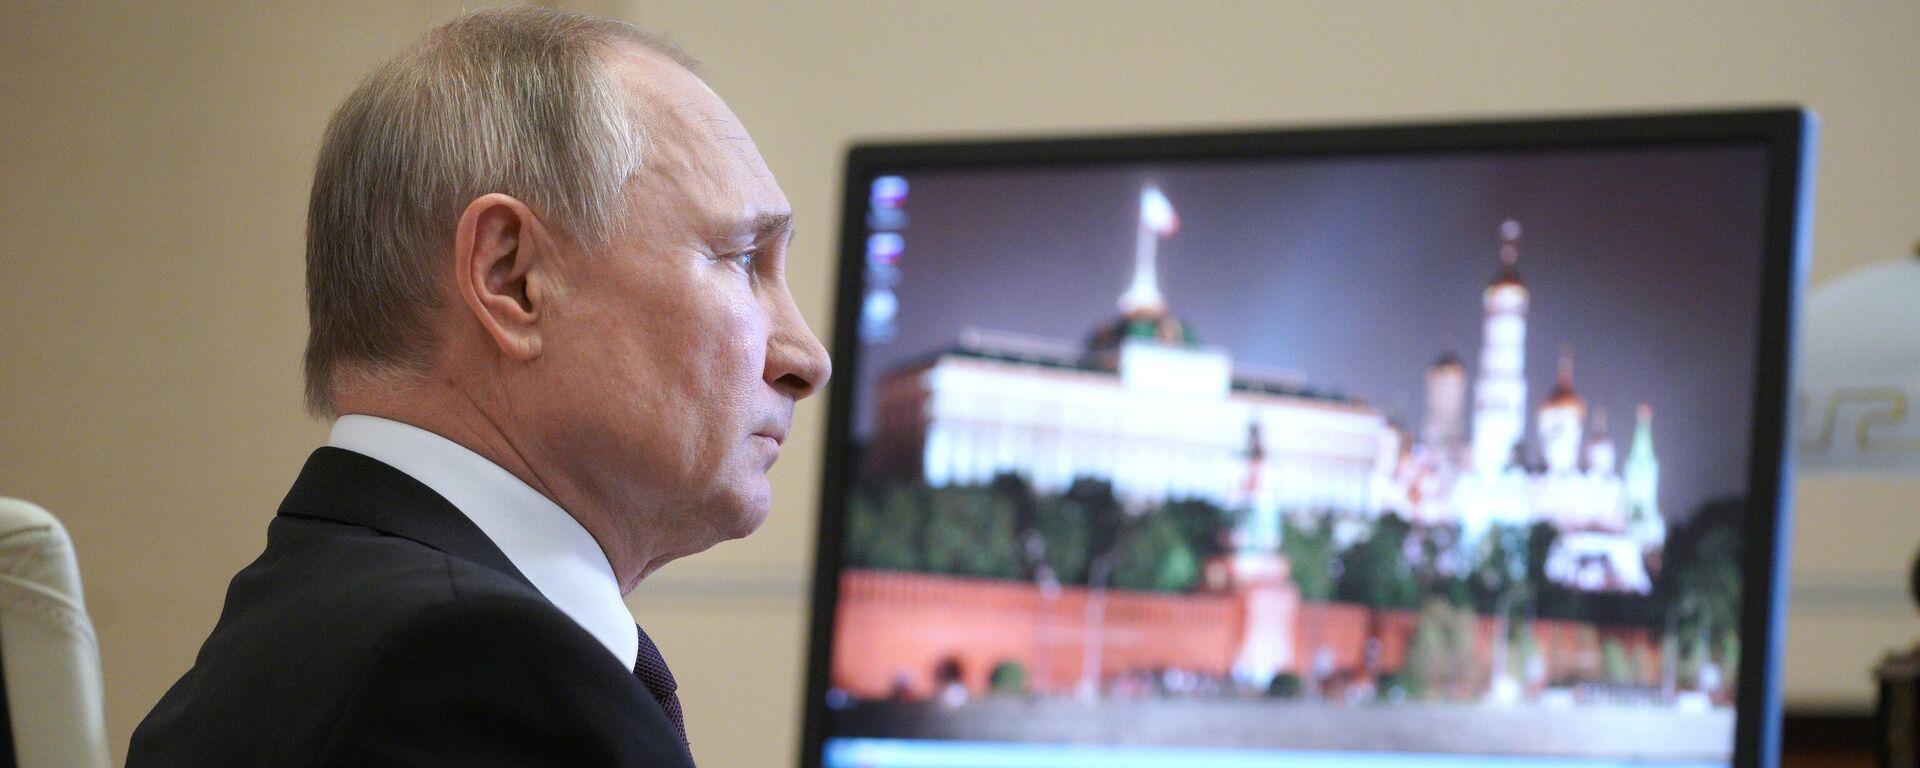 Vladímir Putin, presidente de Rusia - Sputnik Mundo, 1920, 05.05.2021